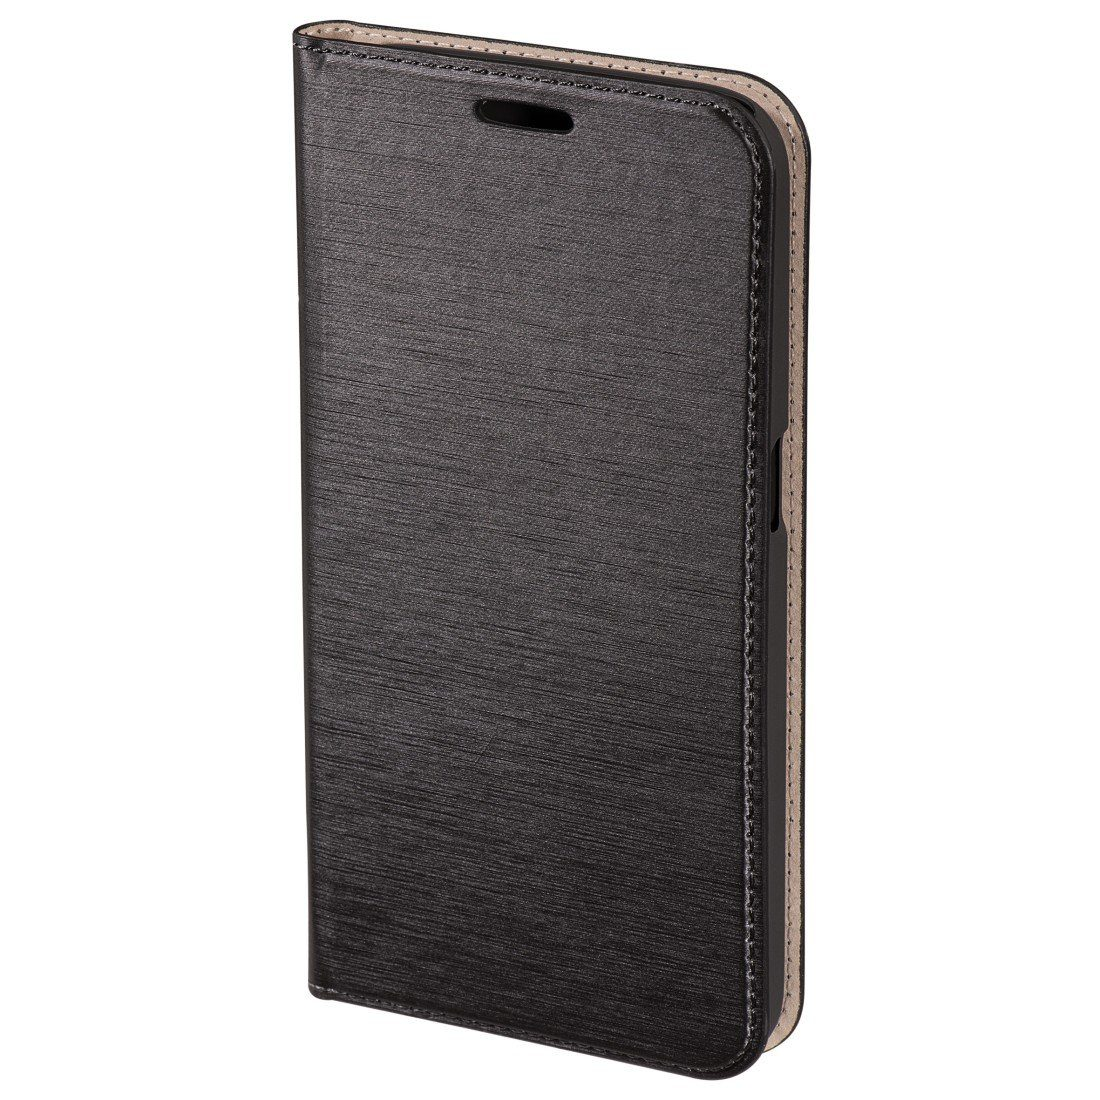 Hama Booklet Slim für Samsung Galaxy S6, Dunkelgrau